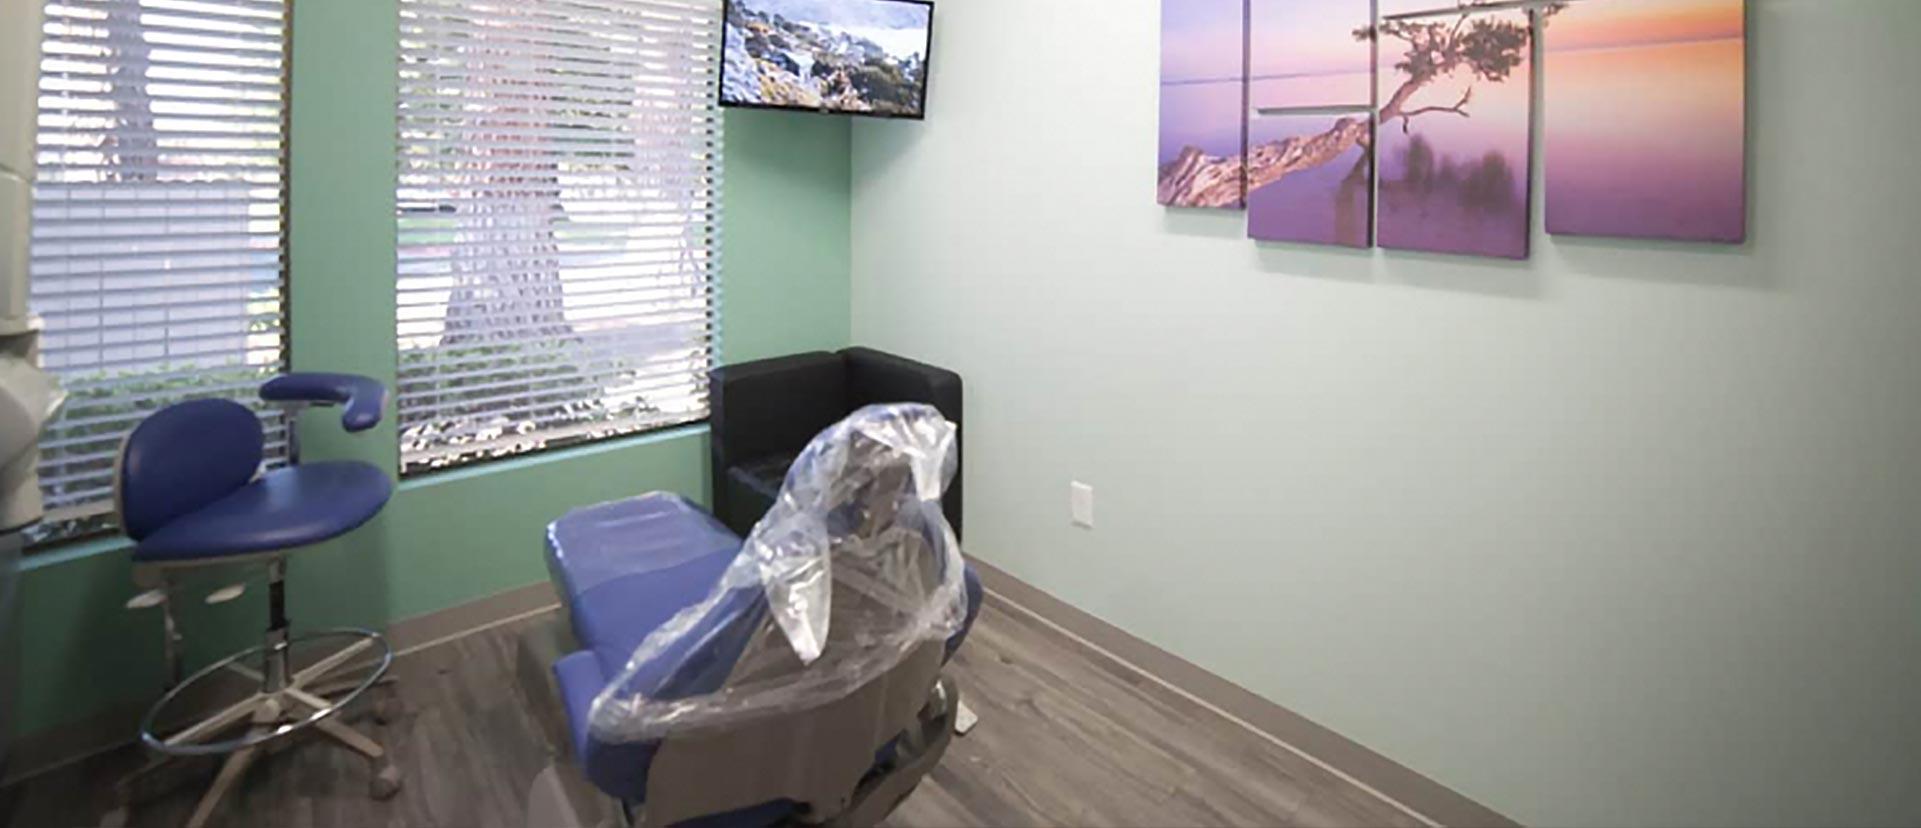 Mark Wong DDS dental room